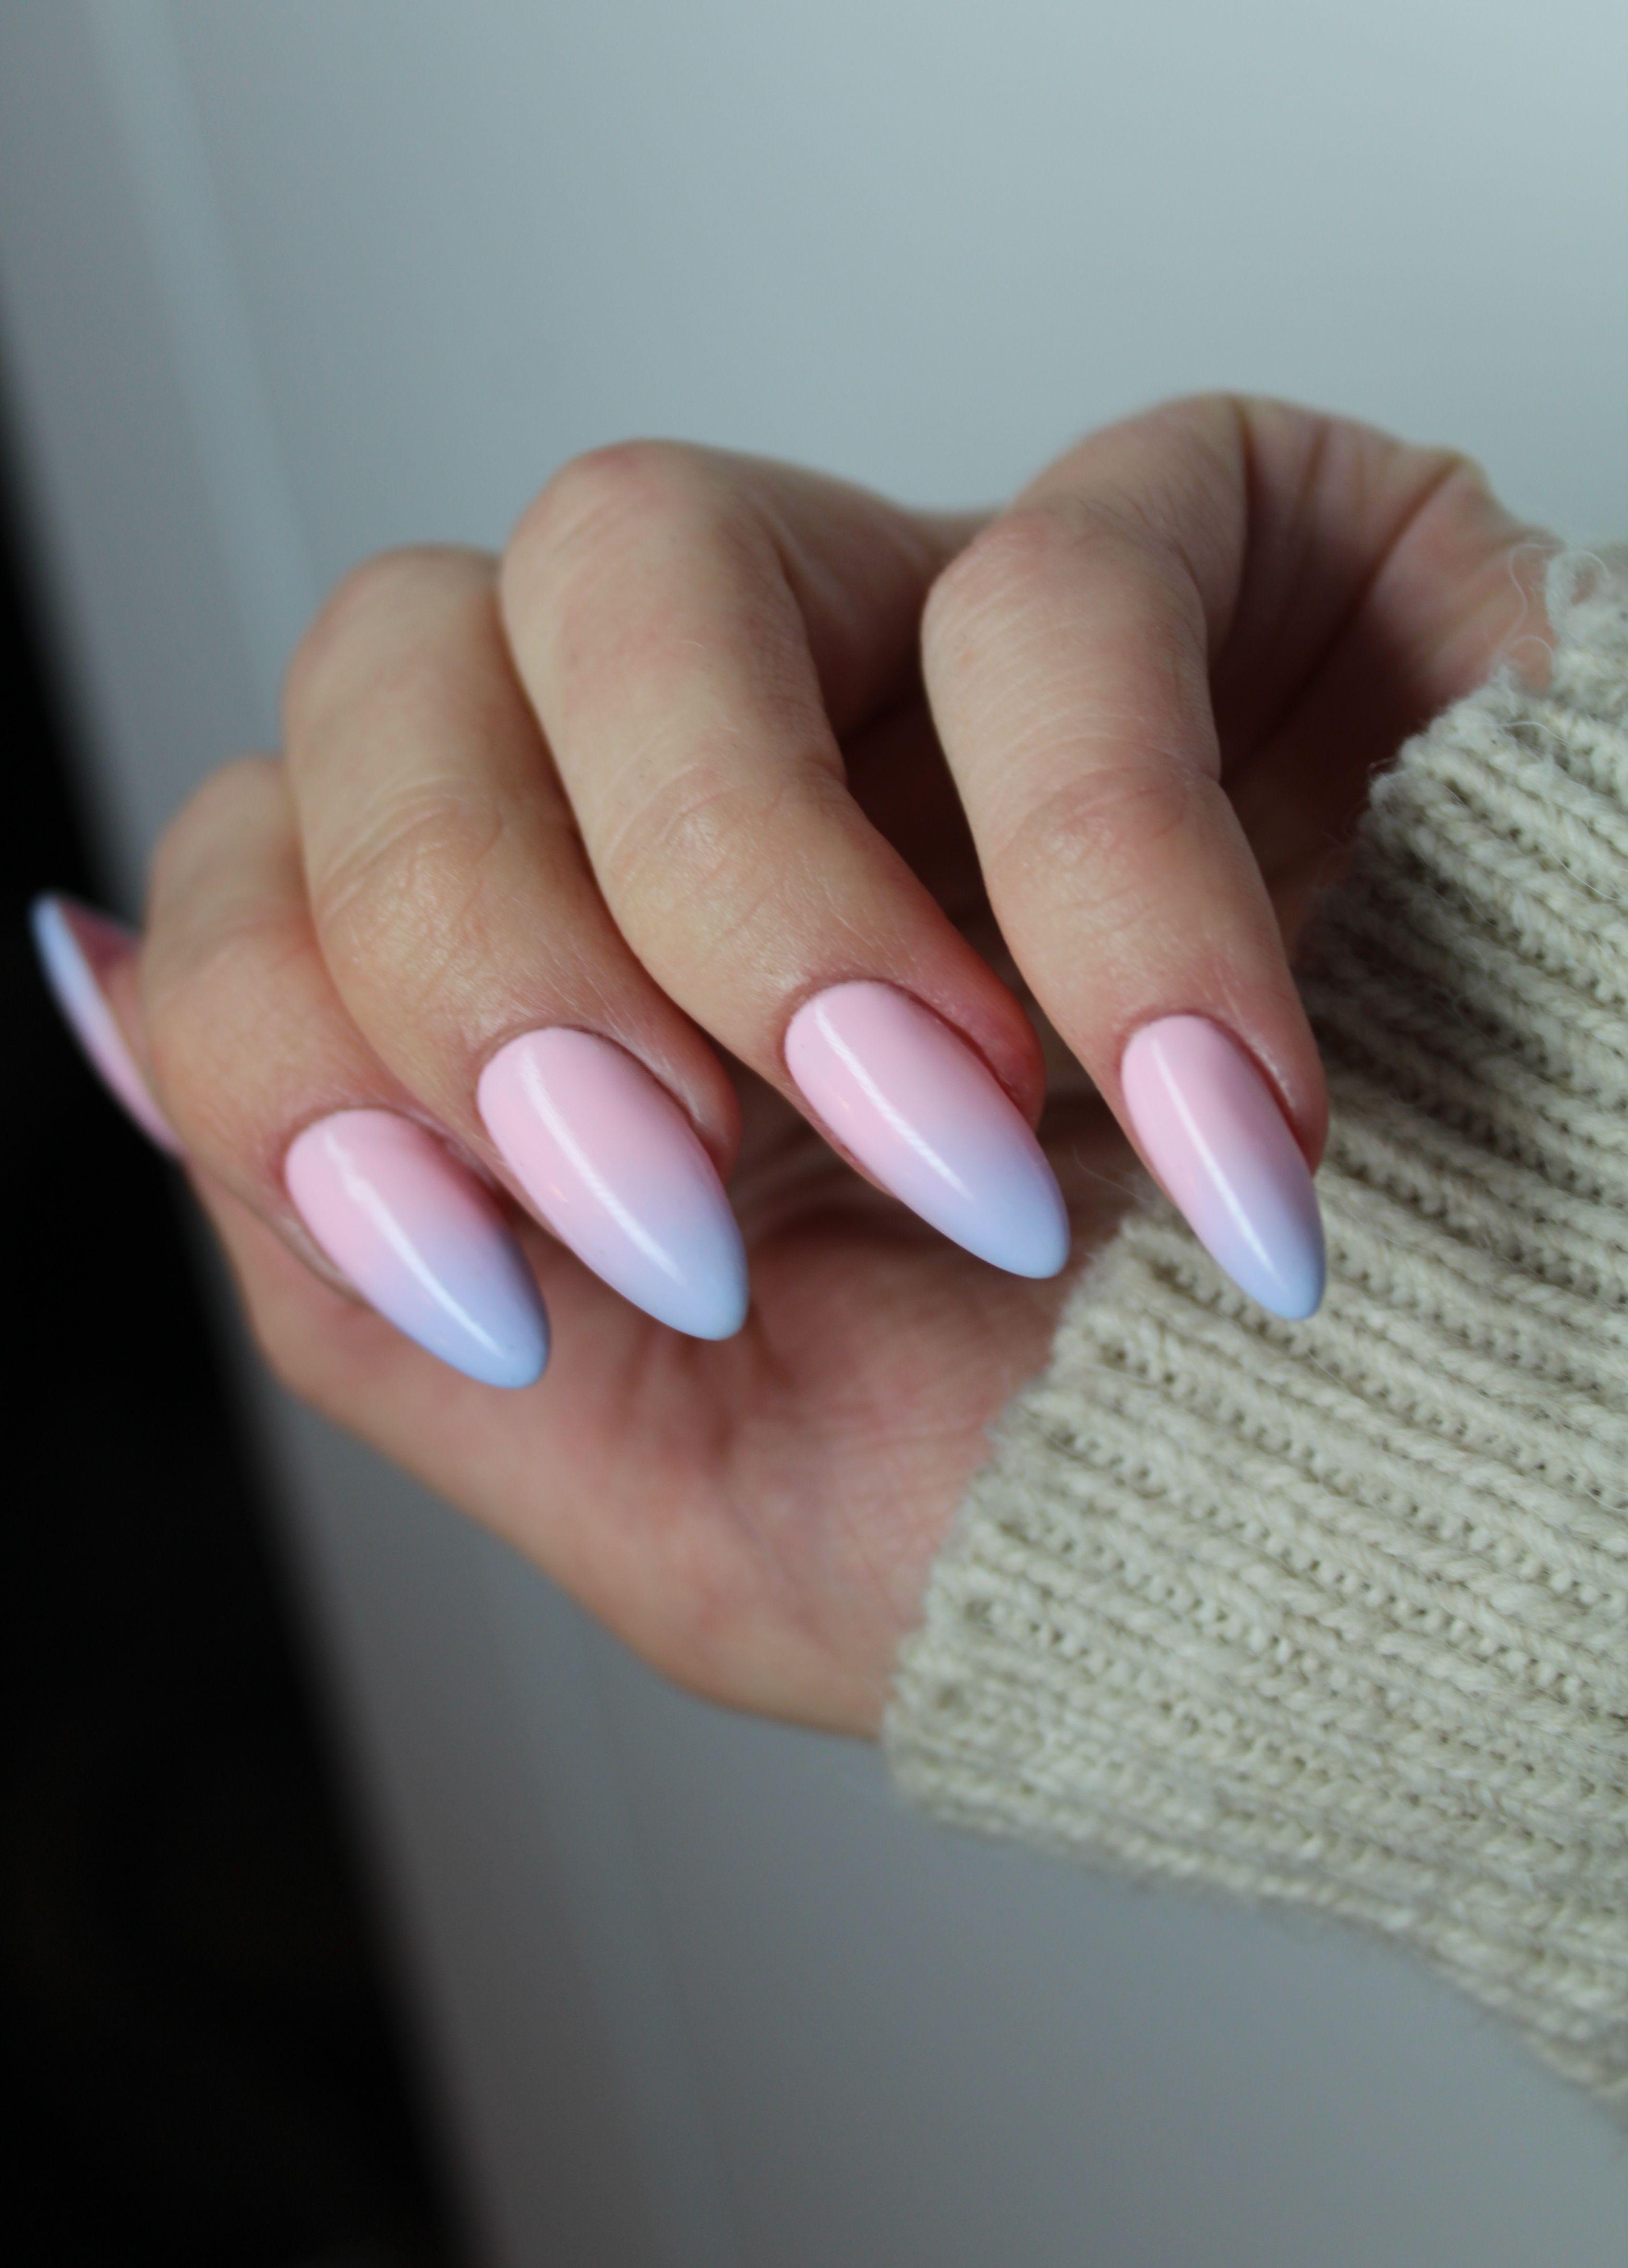 Ombre Ombrenails Paznokcie Pastelombre Pastele Pastelove Pinknails Mani Nails Manicure Springnails Gelove Nehty Francouzska Manikura Nehty